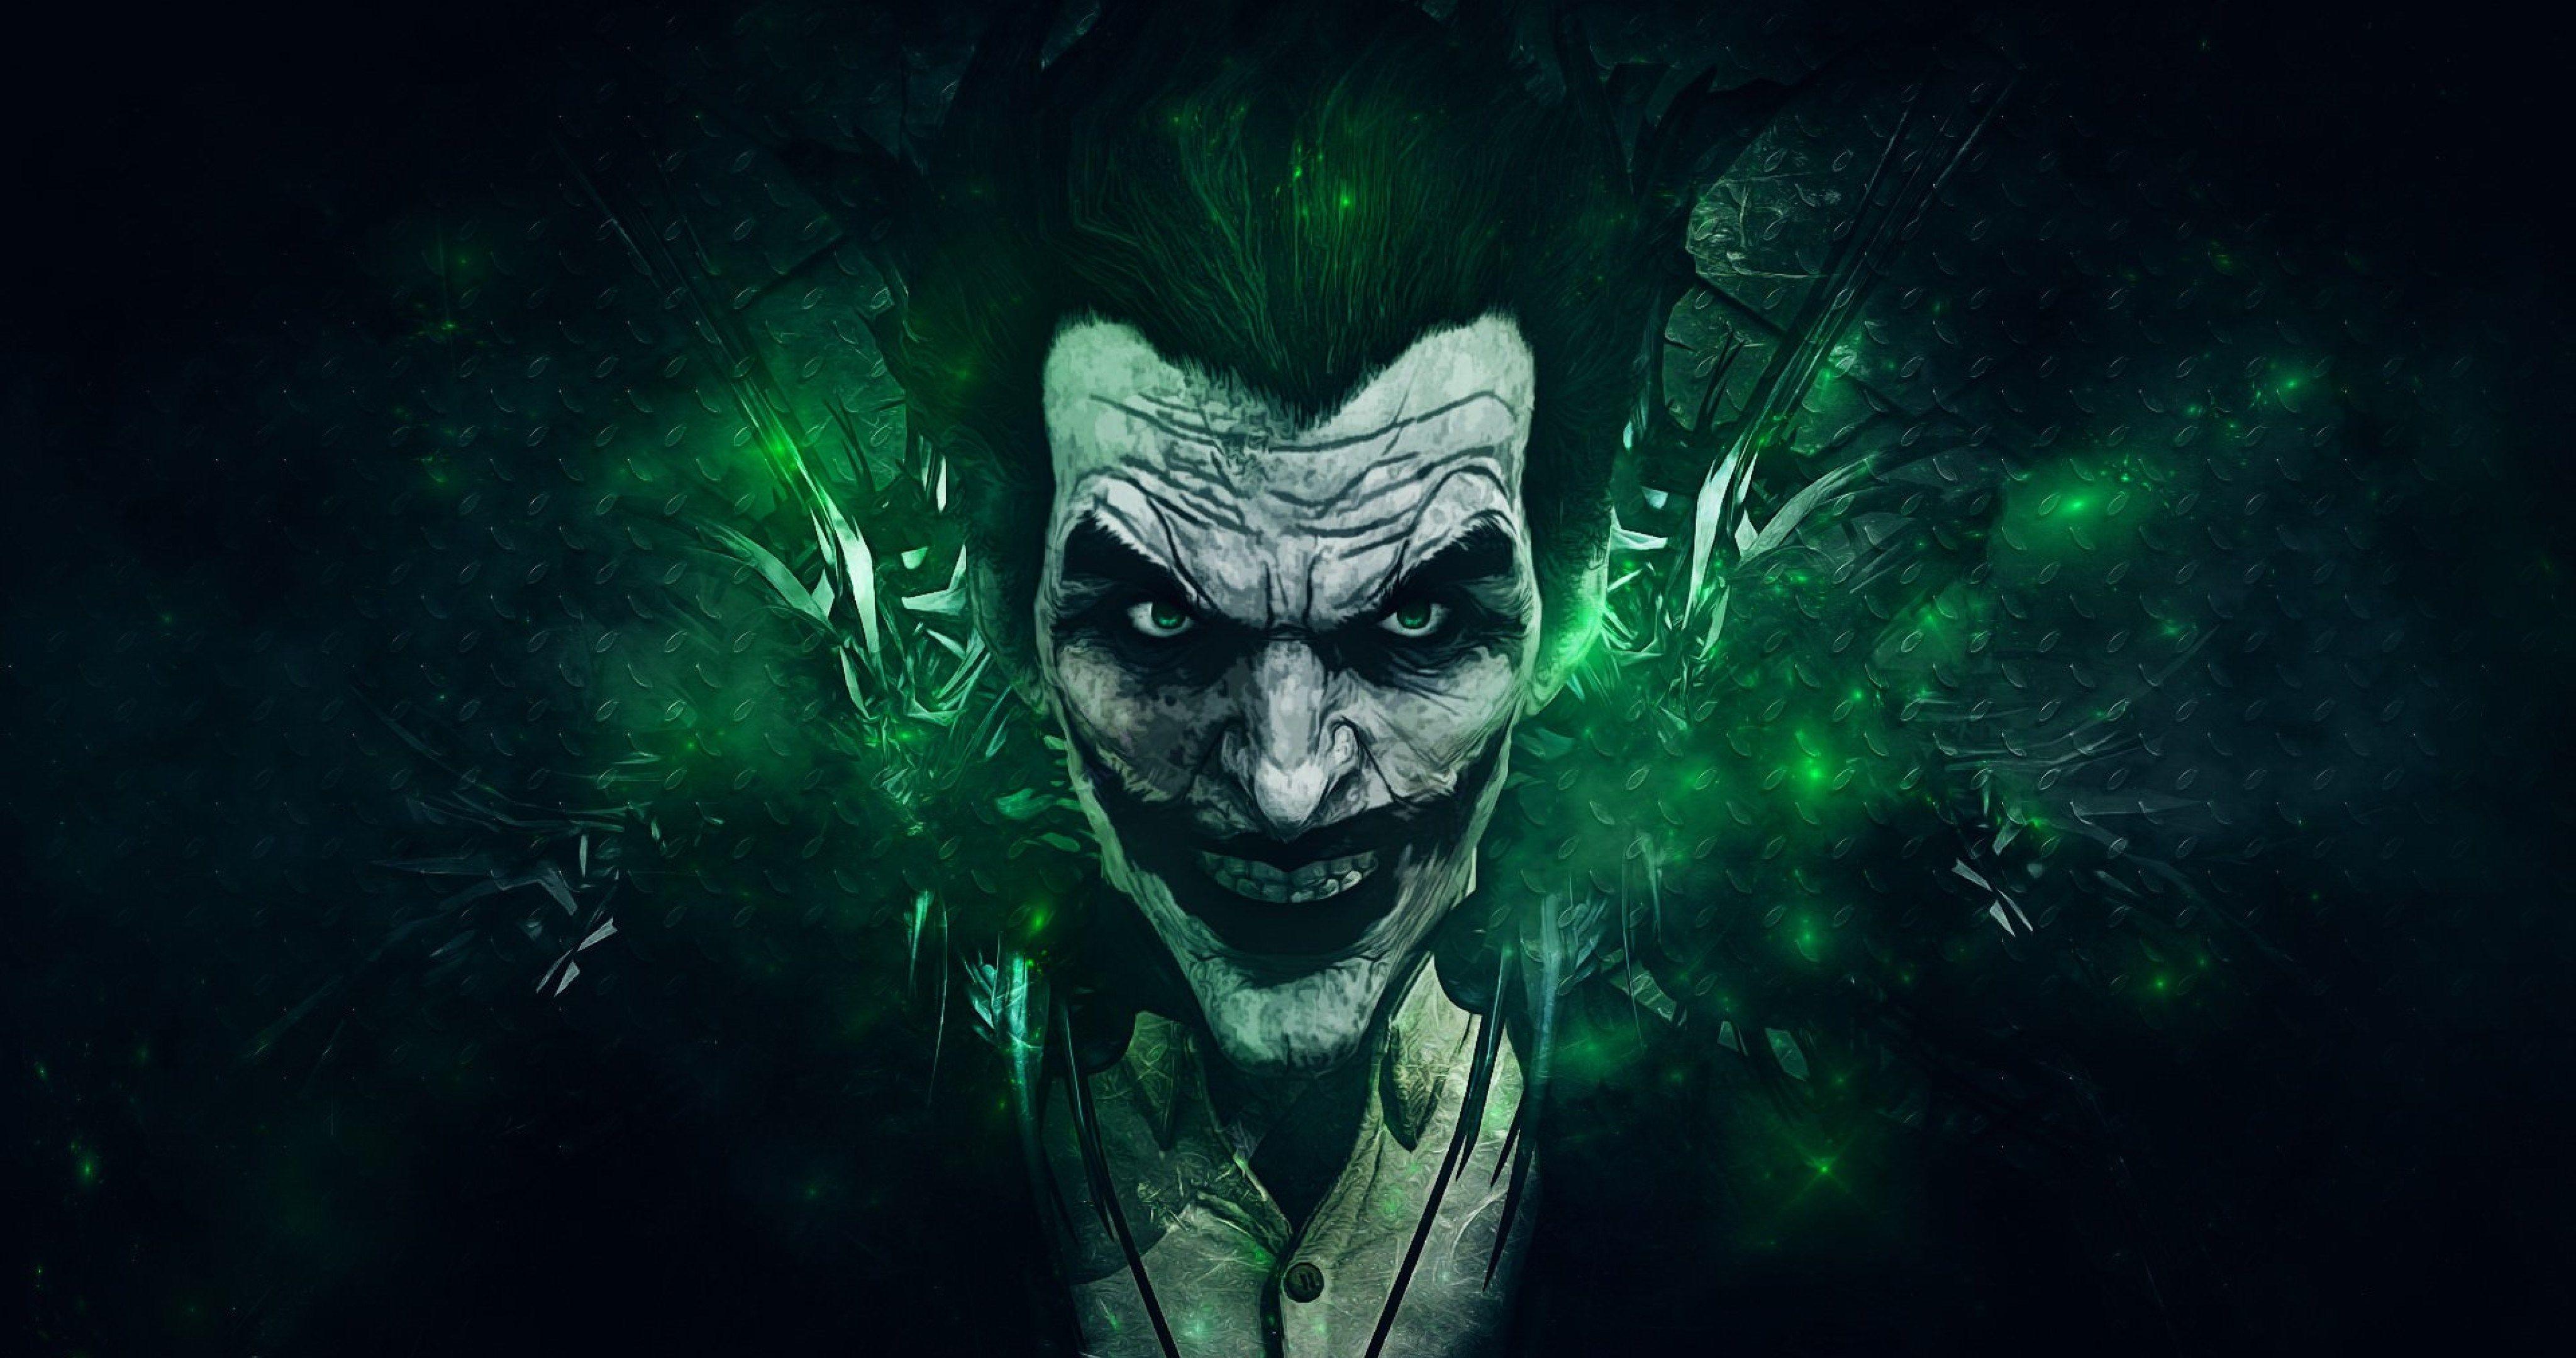 Hd wallpaper of joker - The Joker Batman 4k Ultra Hd Wallpaper